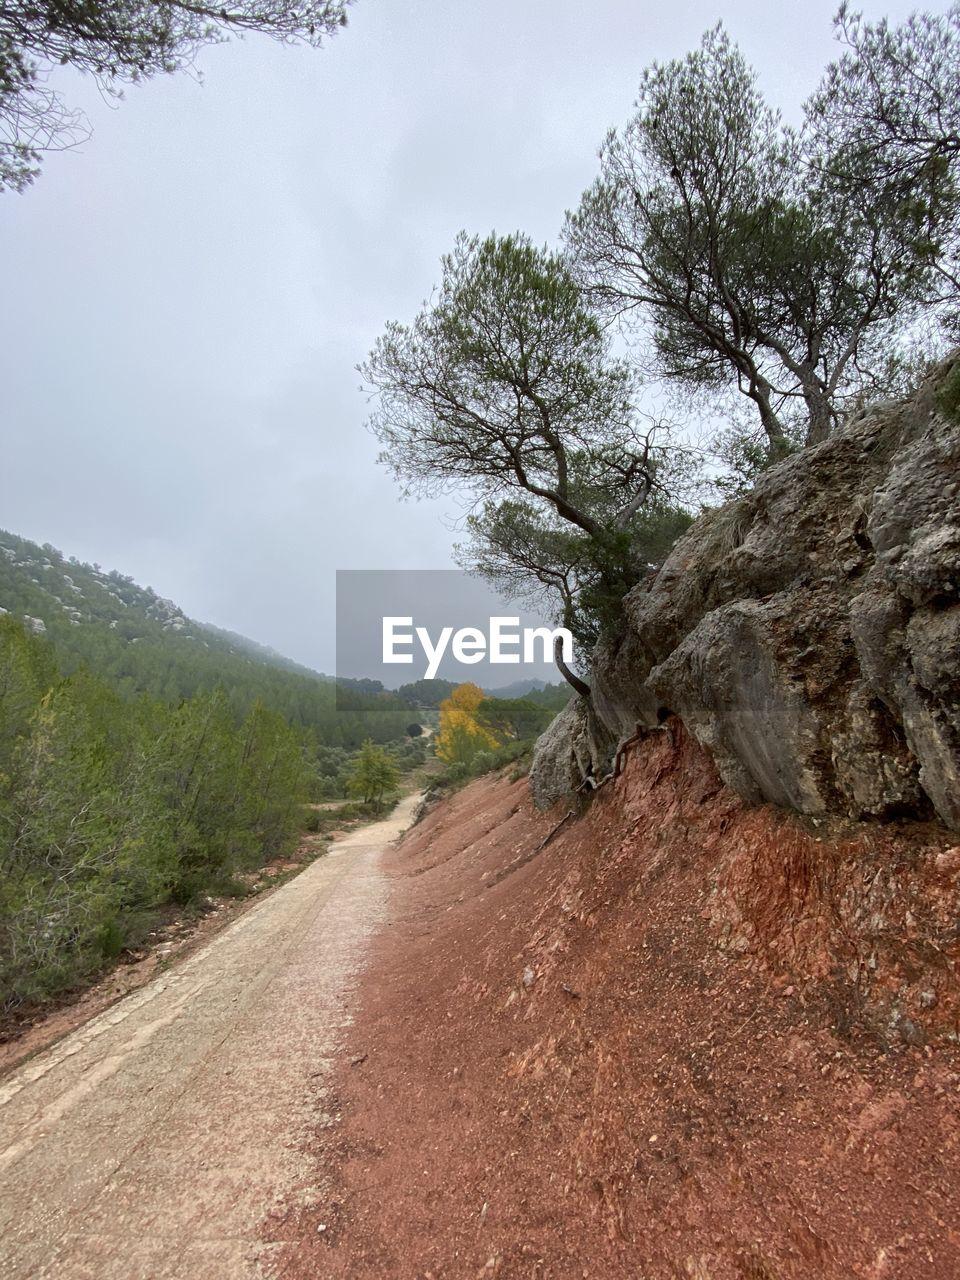 Dirt road by tree against sky